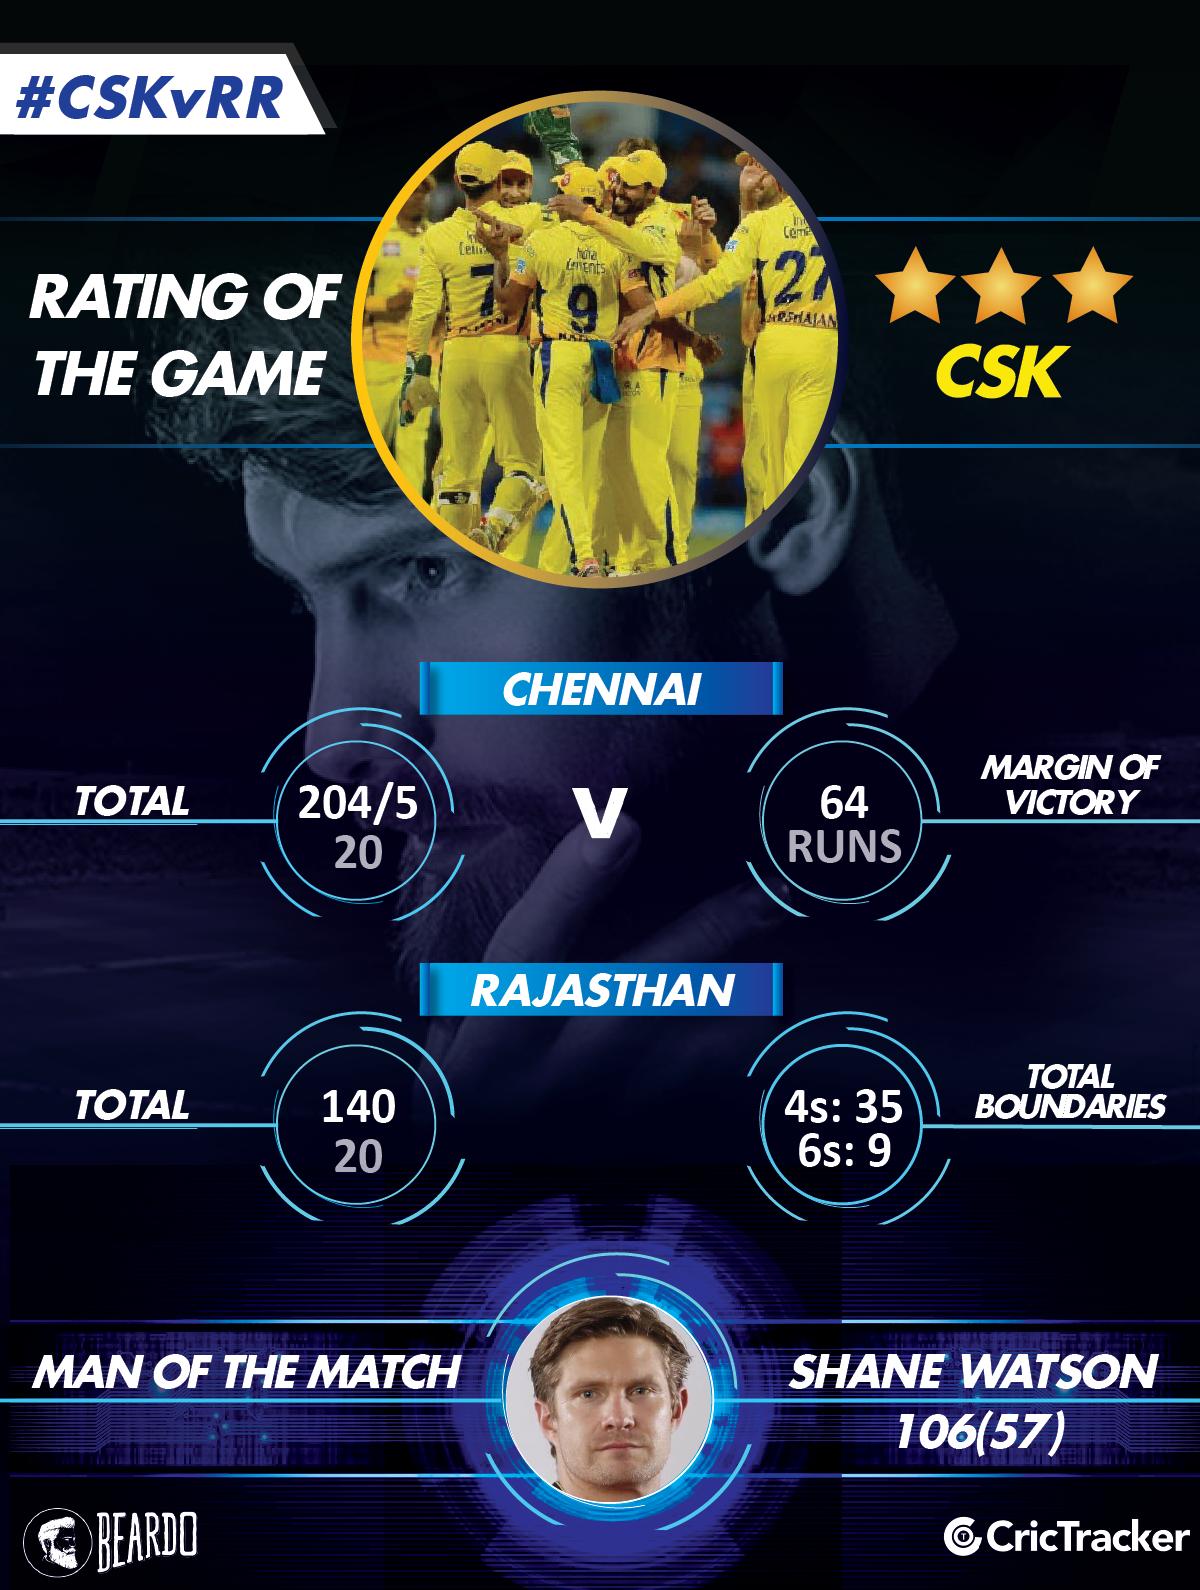 IPL2018-CSK-vs-RR-Rating-of-the-game.jpg